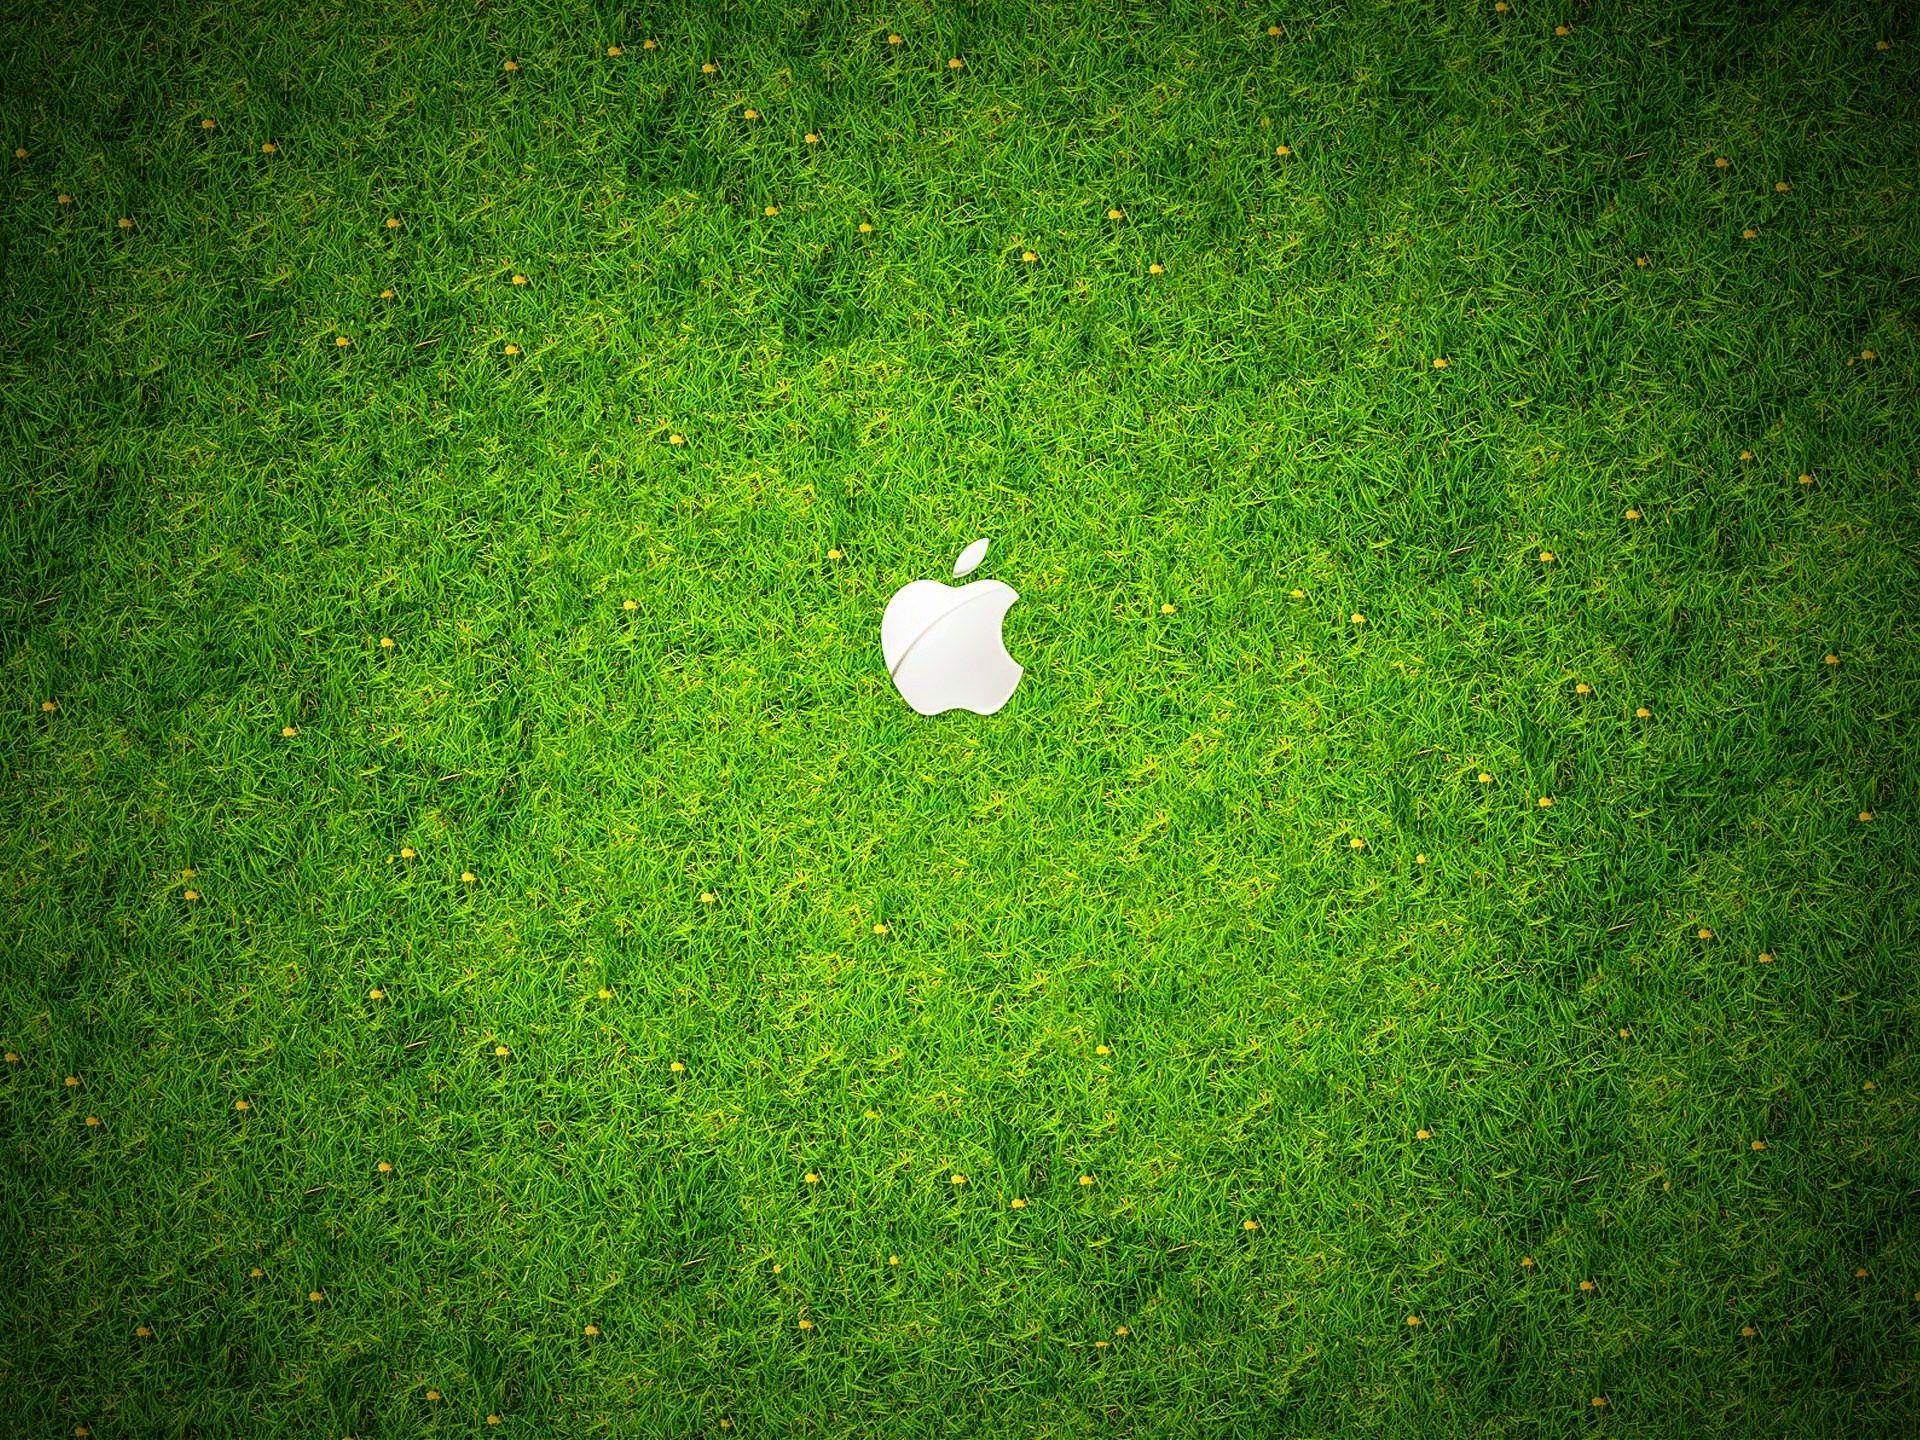 Apple Wallpapers Grass Wallpaper Cave